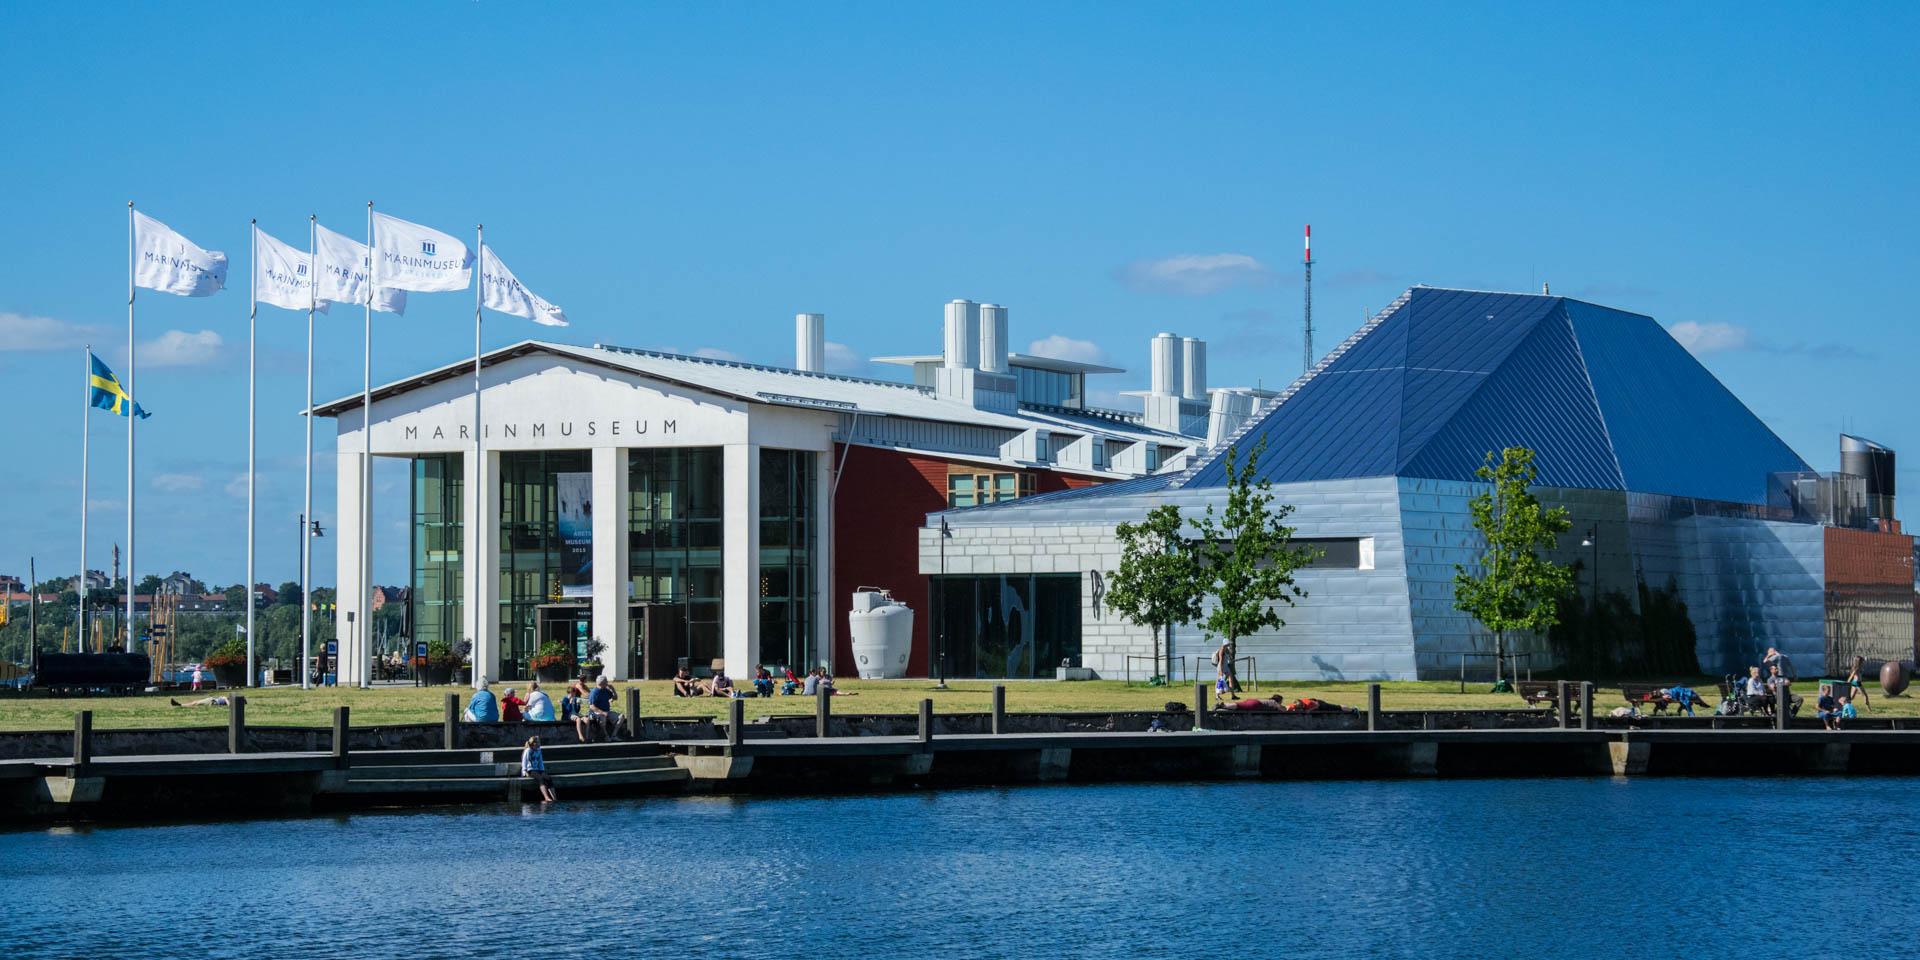 Marinmuseum 2016